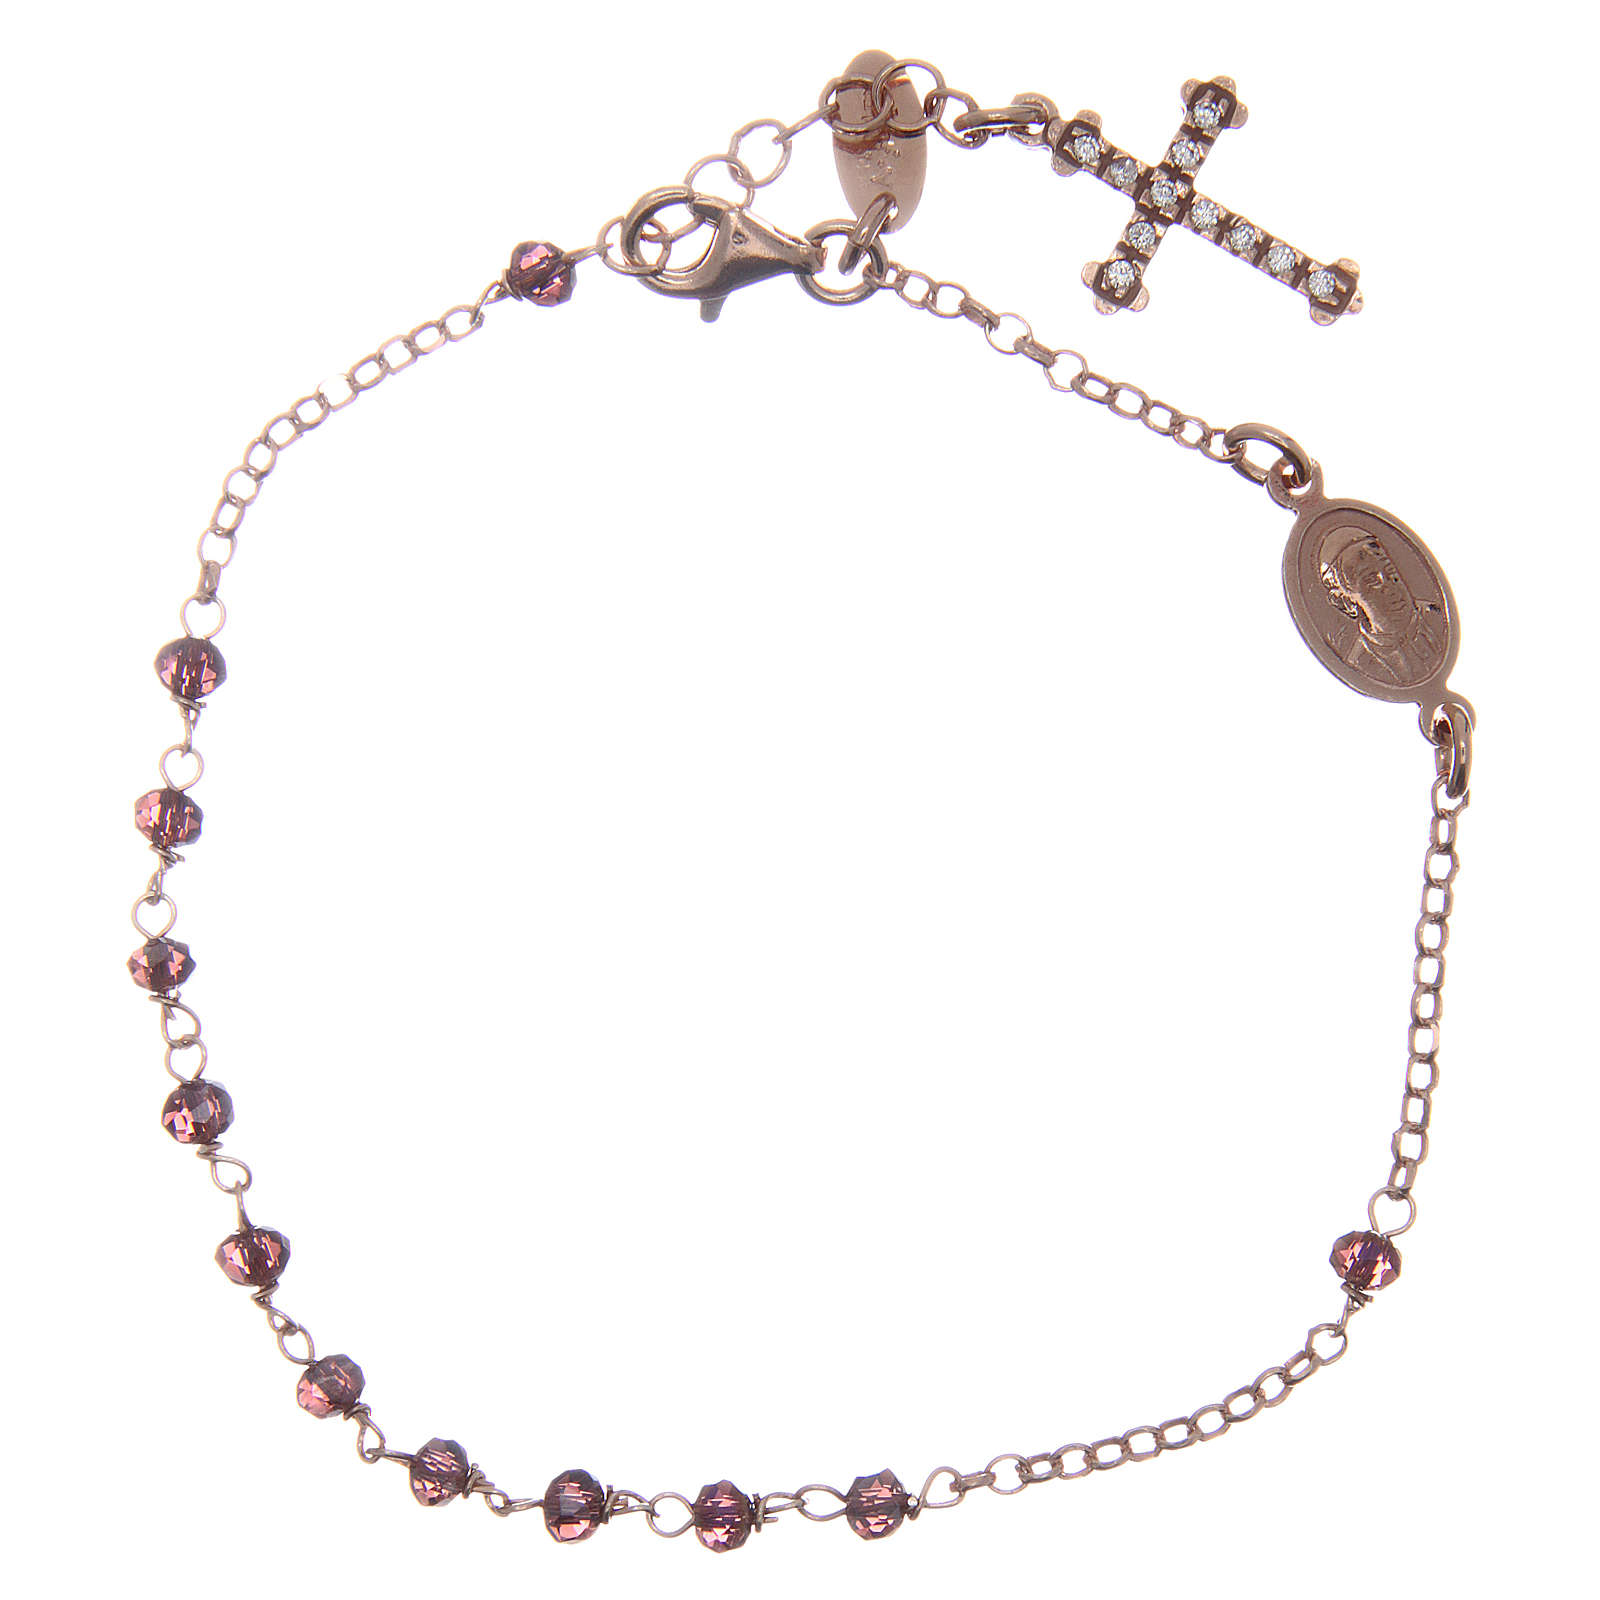 Bracciale AMEN arg 925 rosé medaglietta croce cristalli viola zirconi bianchi 4